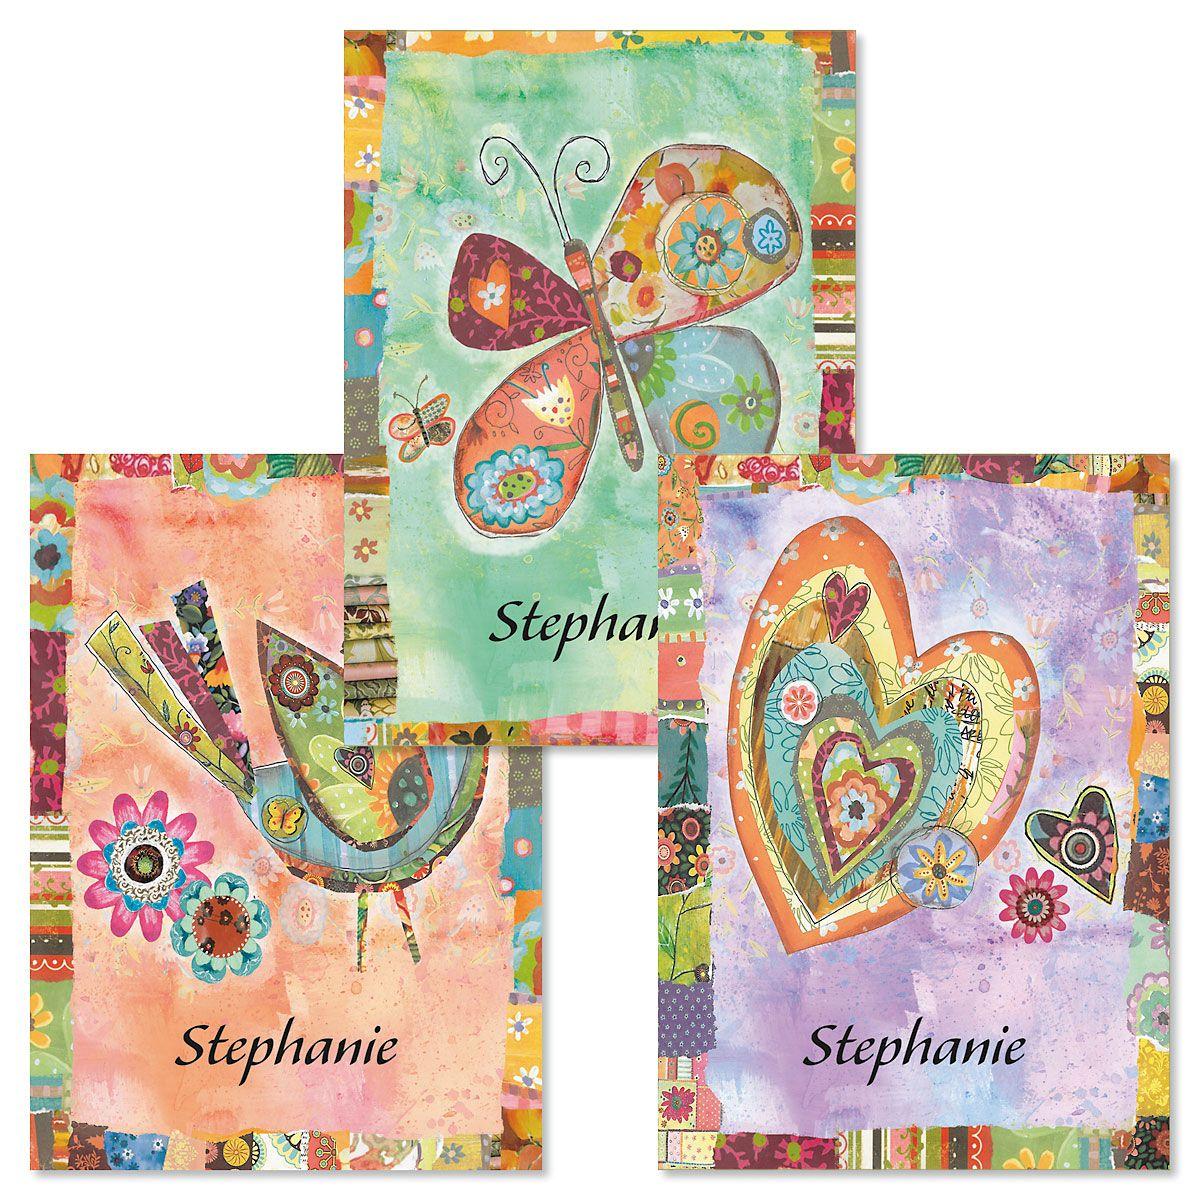 Lori Siebert Personalized Note Cards